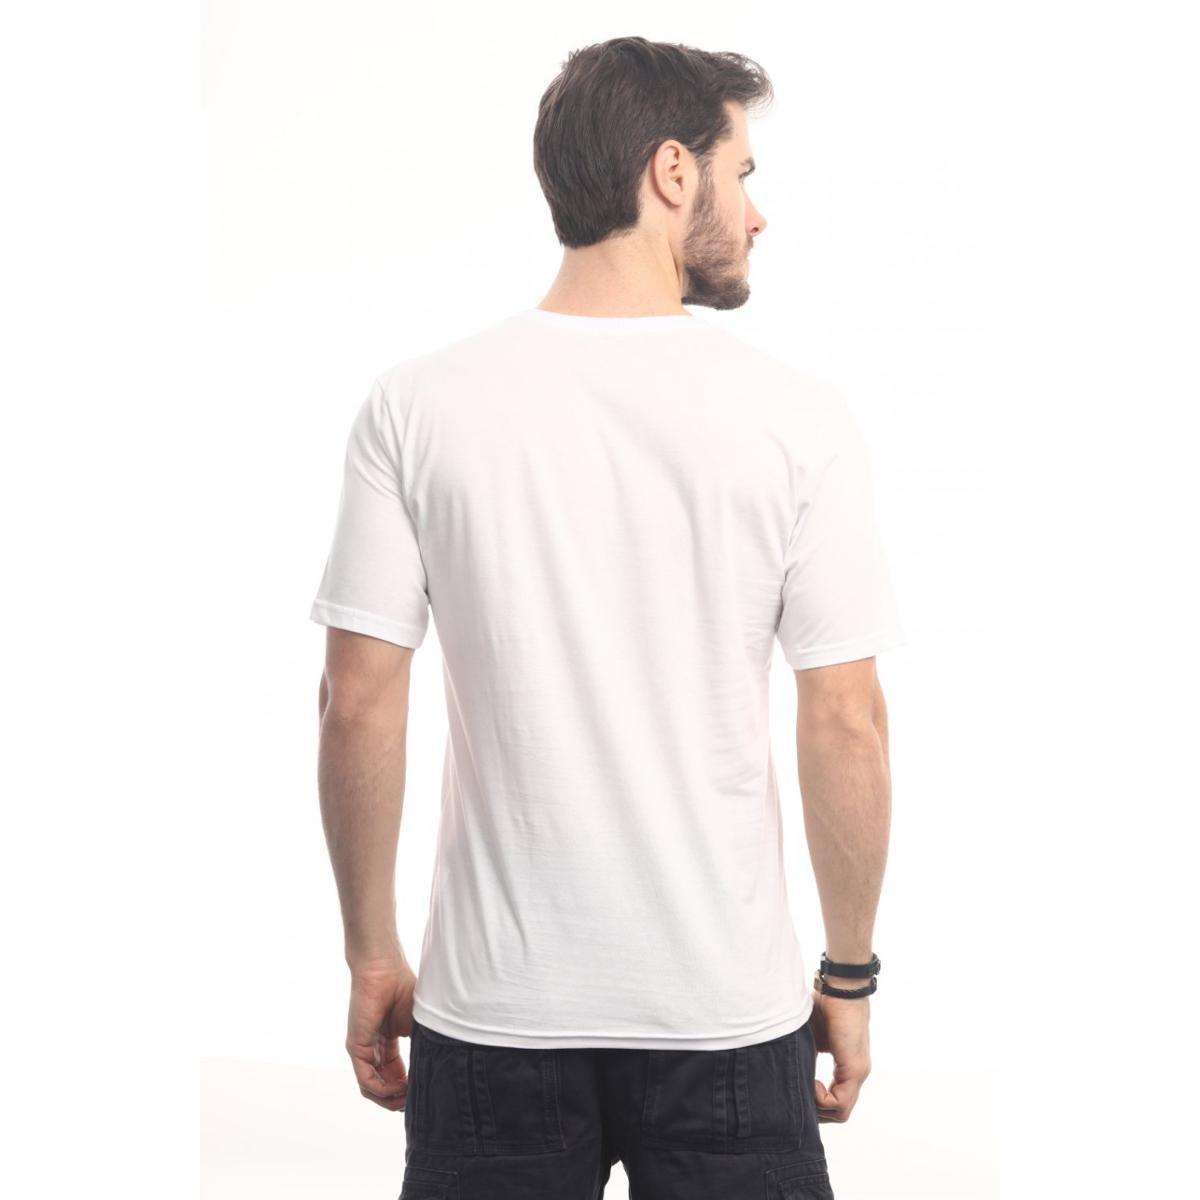 Camiseta Head Play Escape Folhas Masculina - Branco